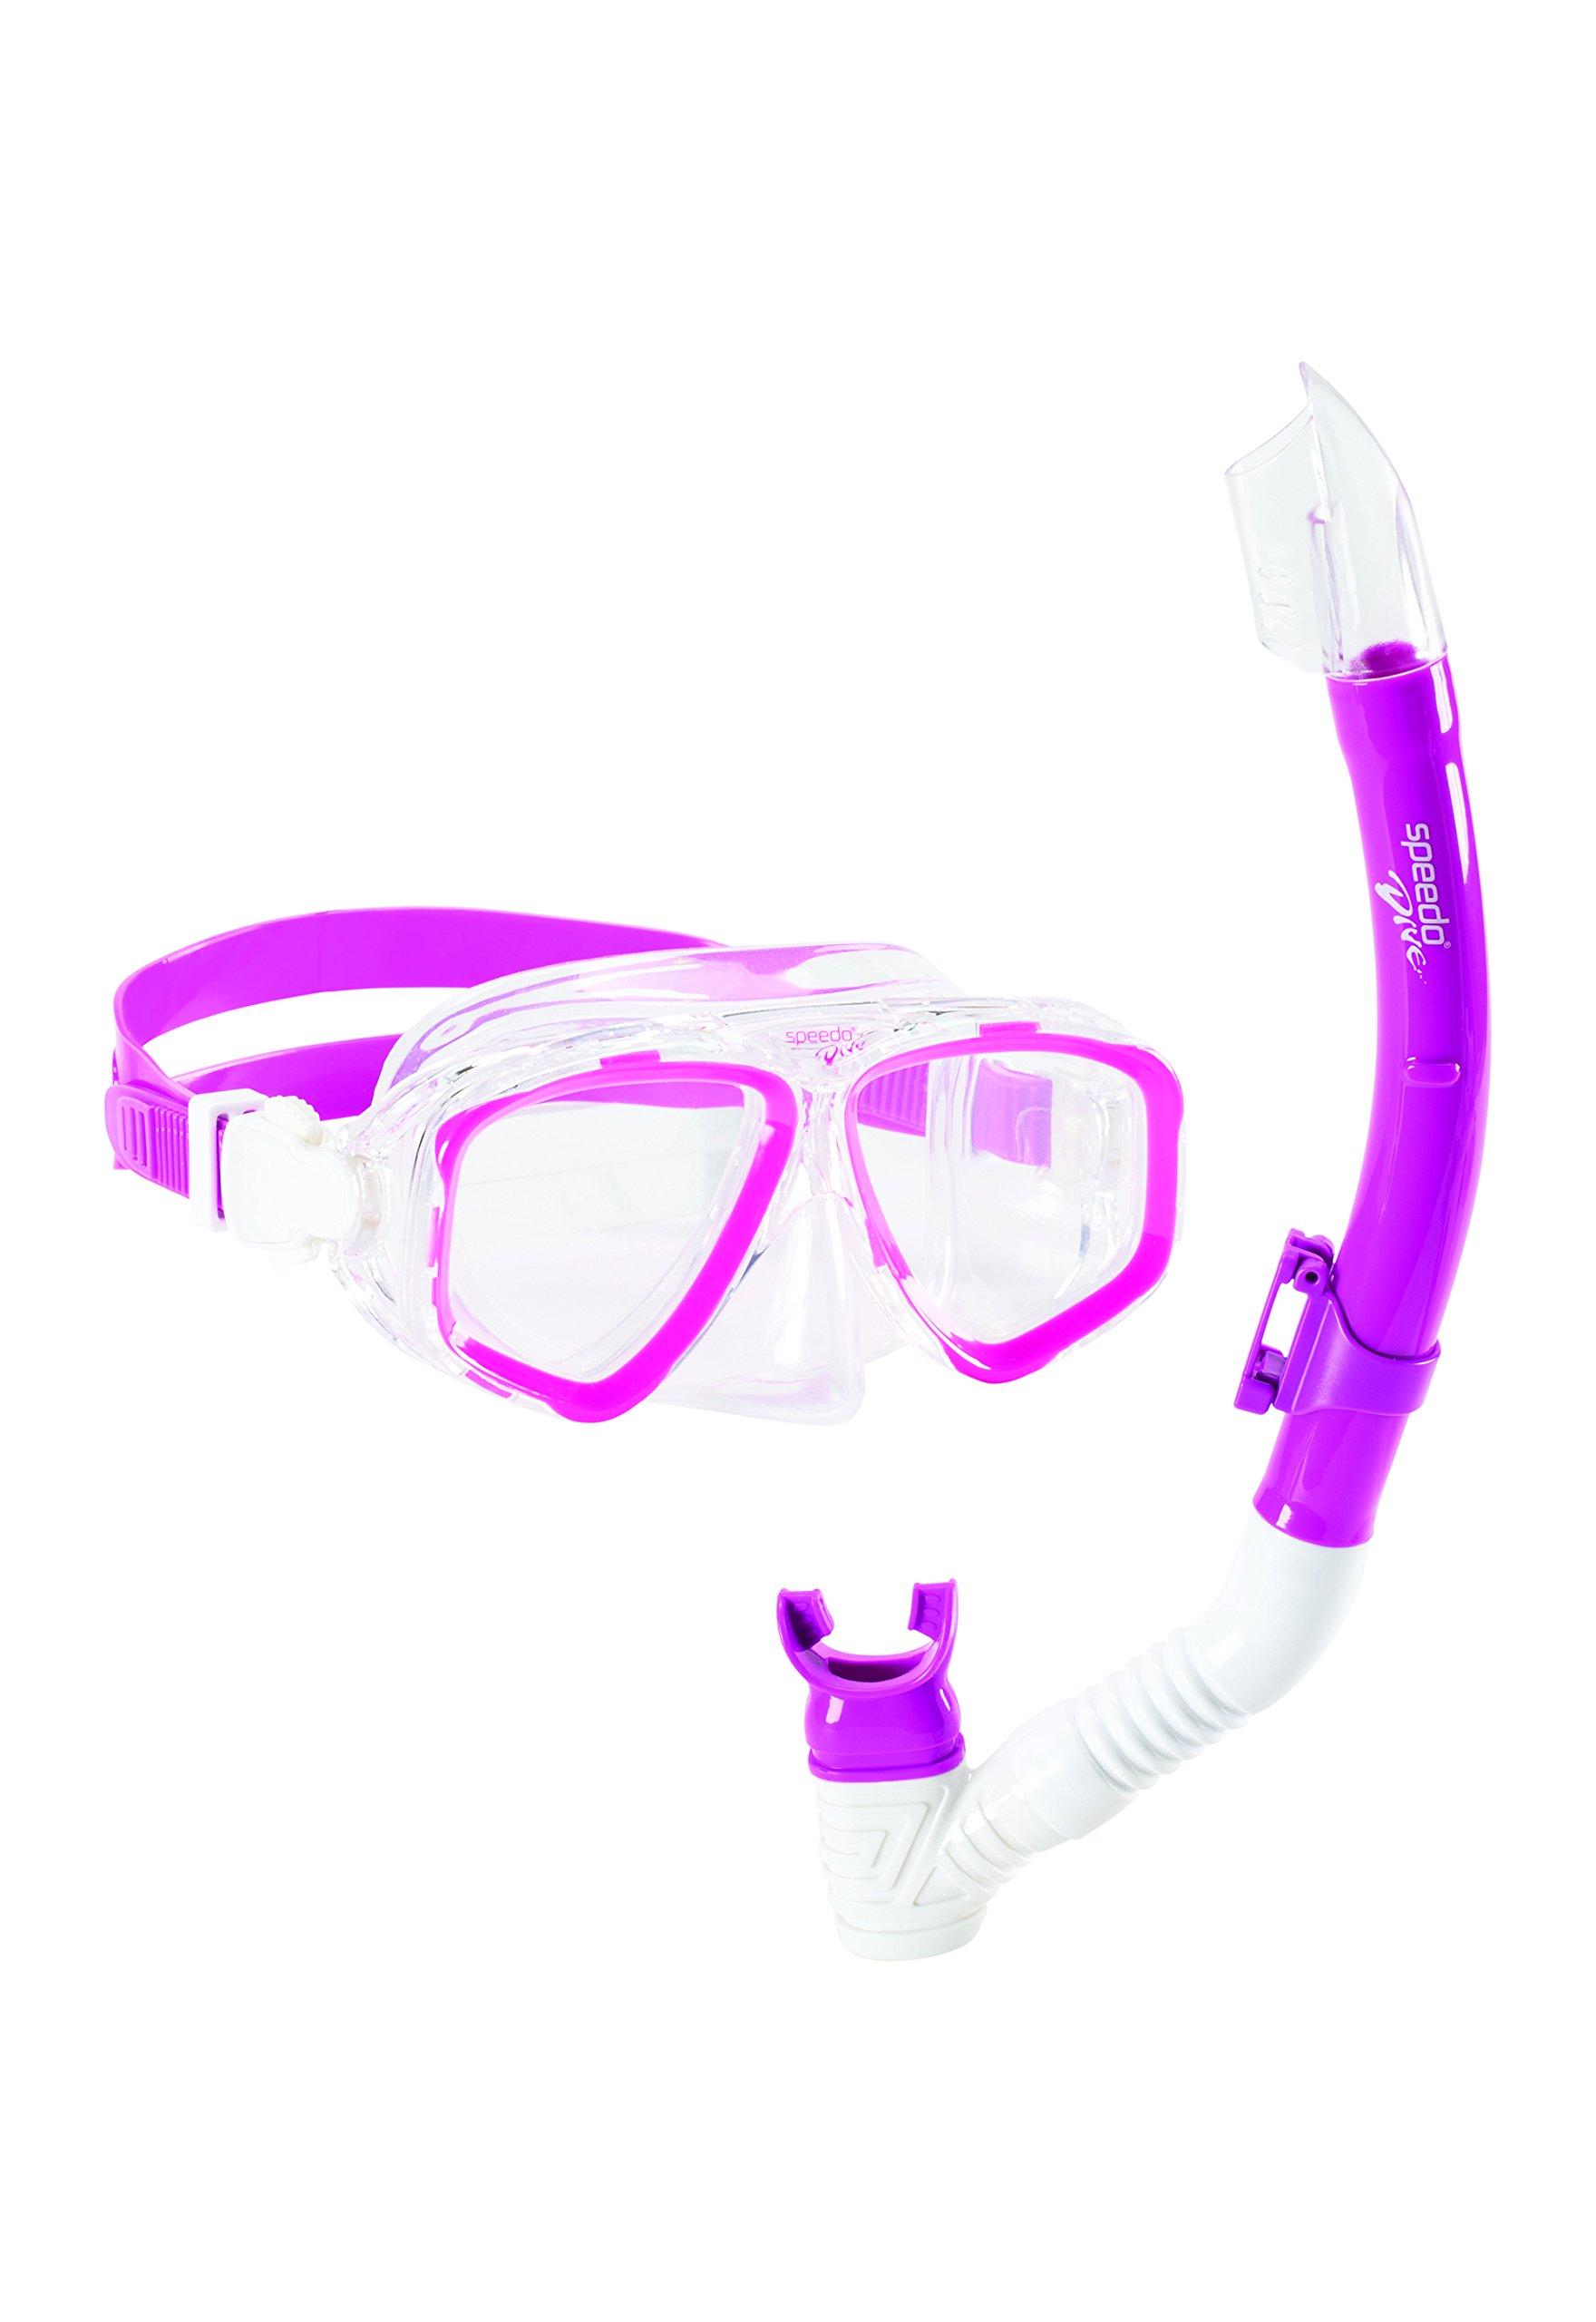 Speedo Adventure Mask/Snorkel Set, Pink Frost, One Size by Speedo